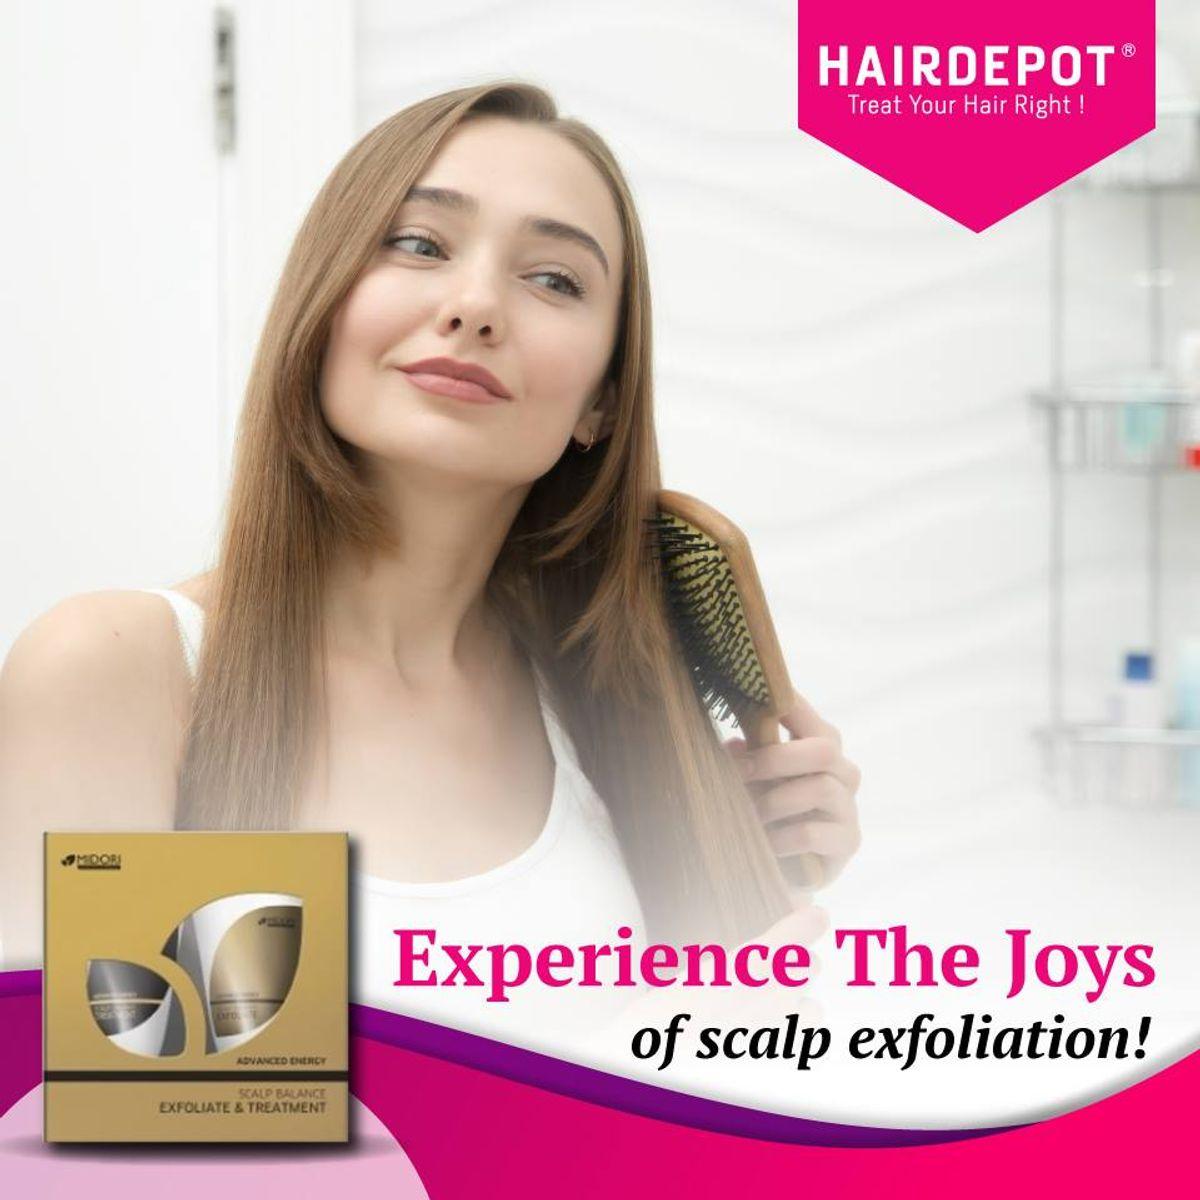 Experience the joys of Scalp Exfoliation!